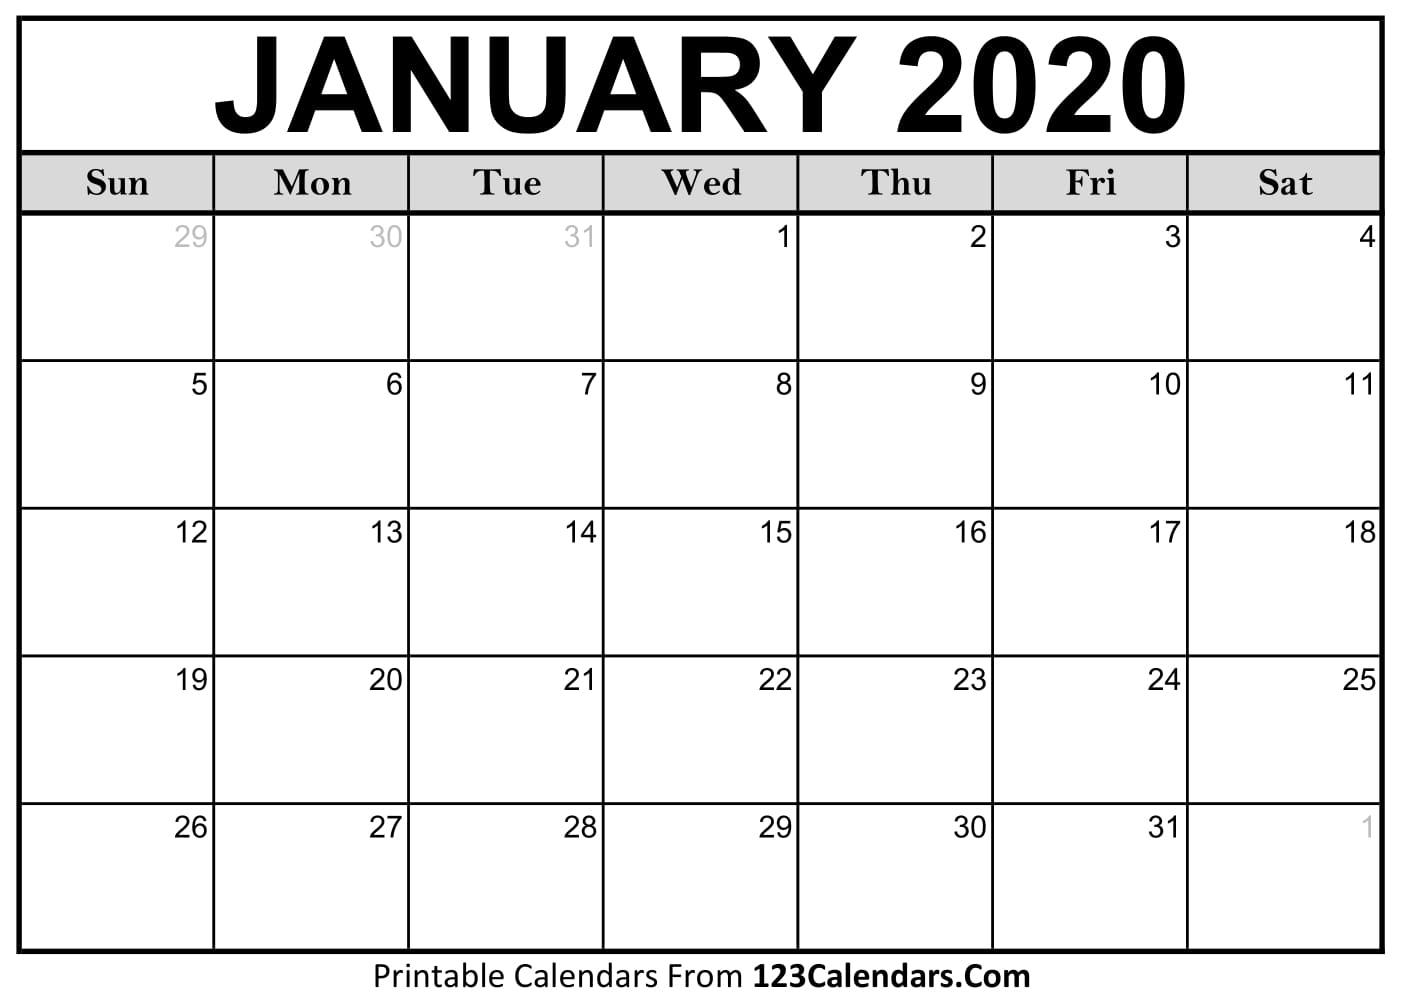 Free Printable Calendar | 123Calendars in 123 Calendars December 2020